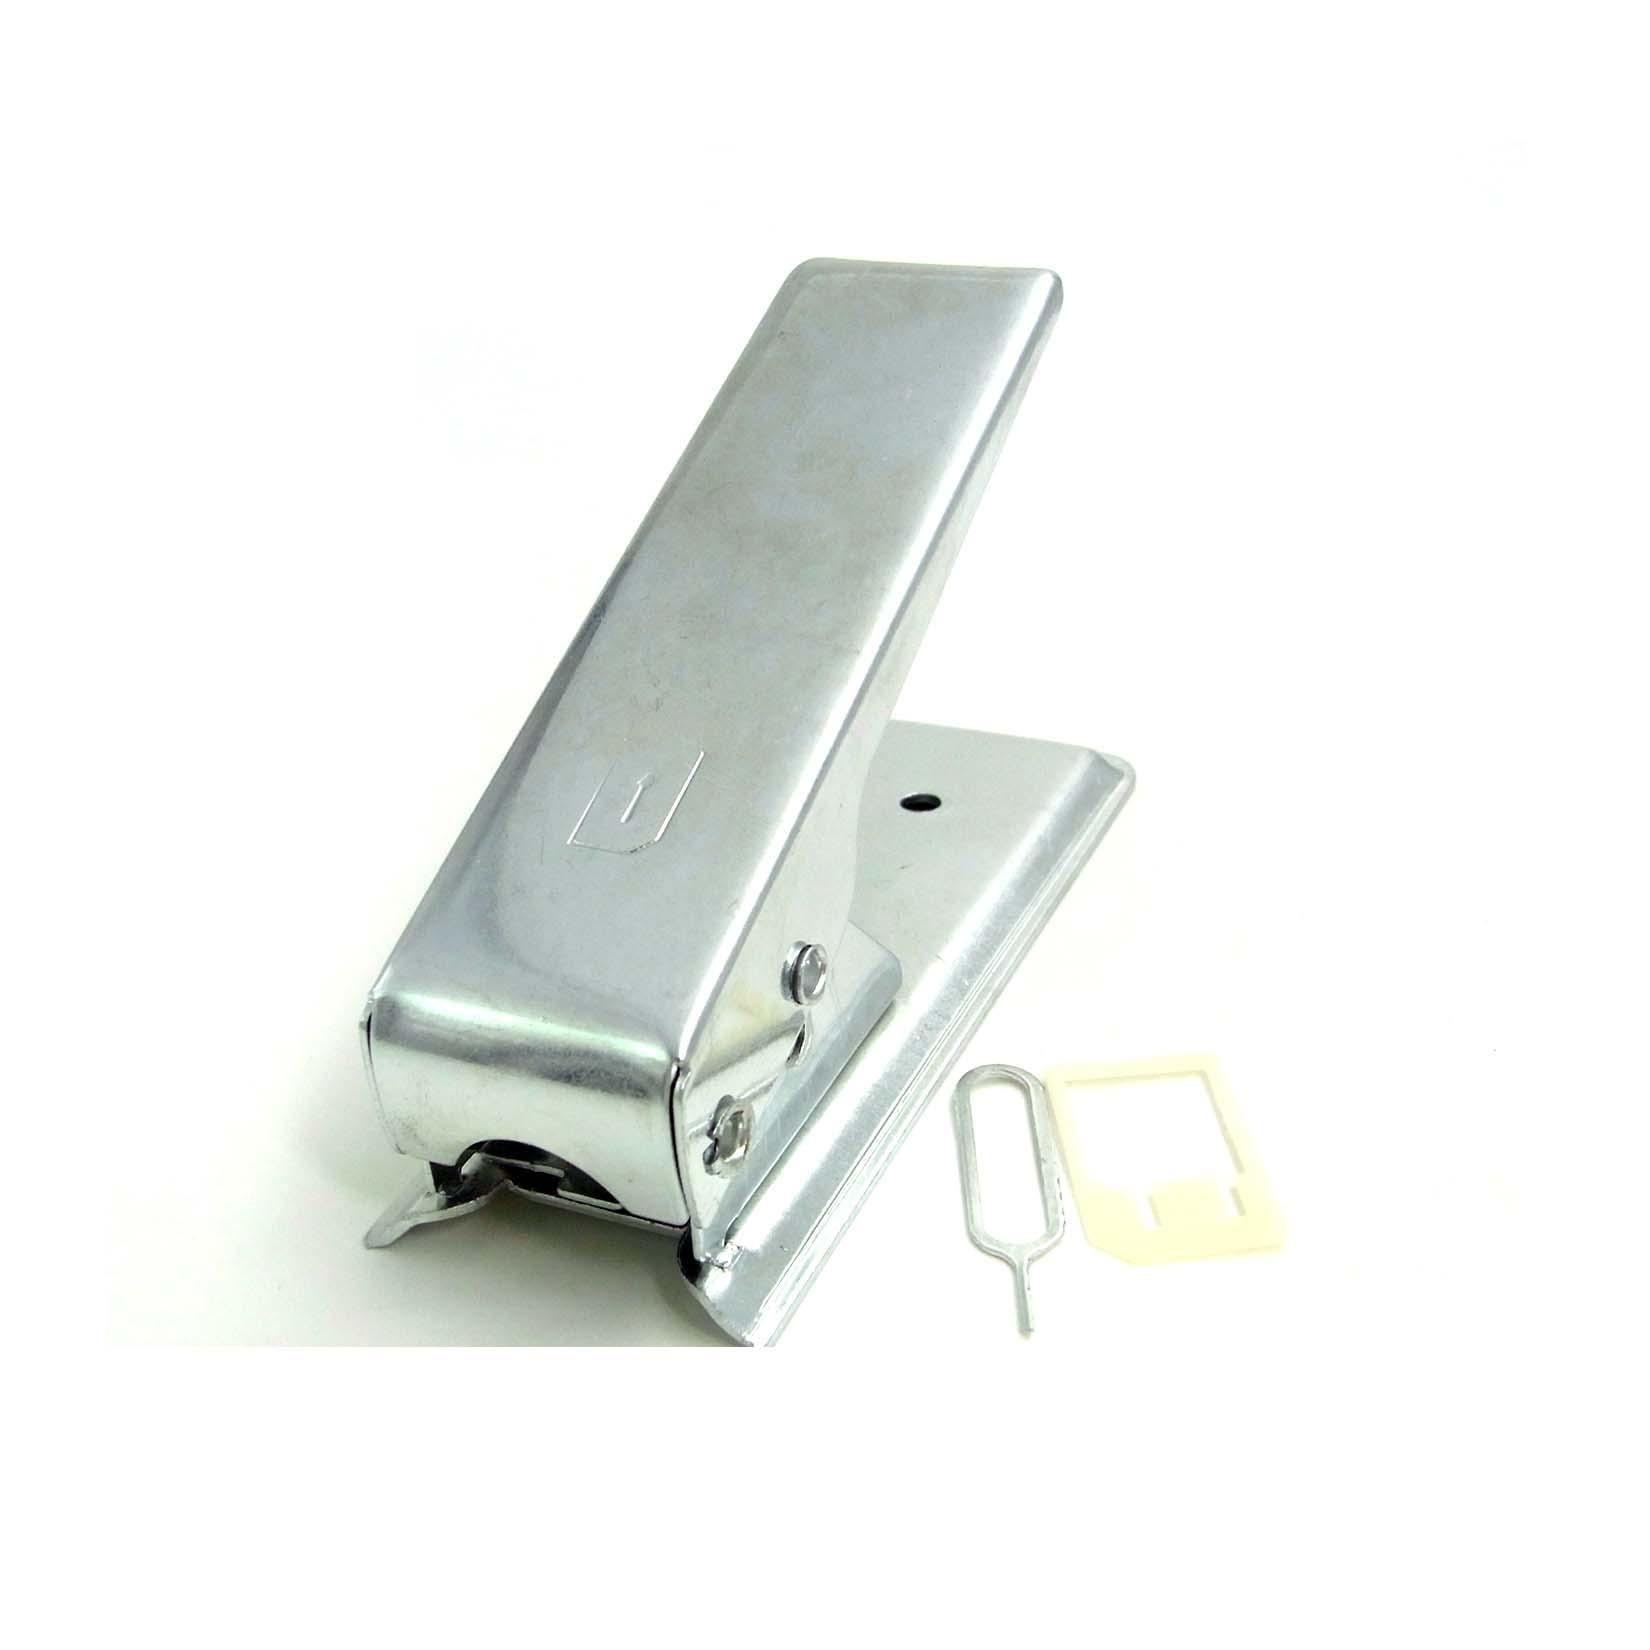 micro sim cutter karten stanze f r iphone 4 ipad adapter silver ebay. Black Bedroom Furniture Sets. Home Design Ideas